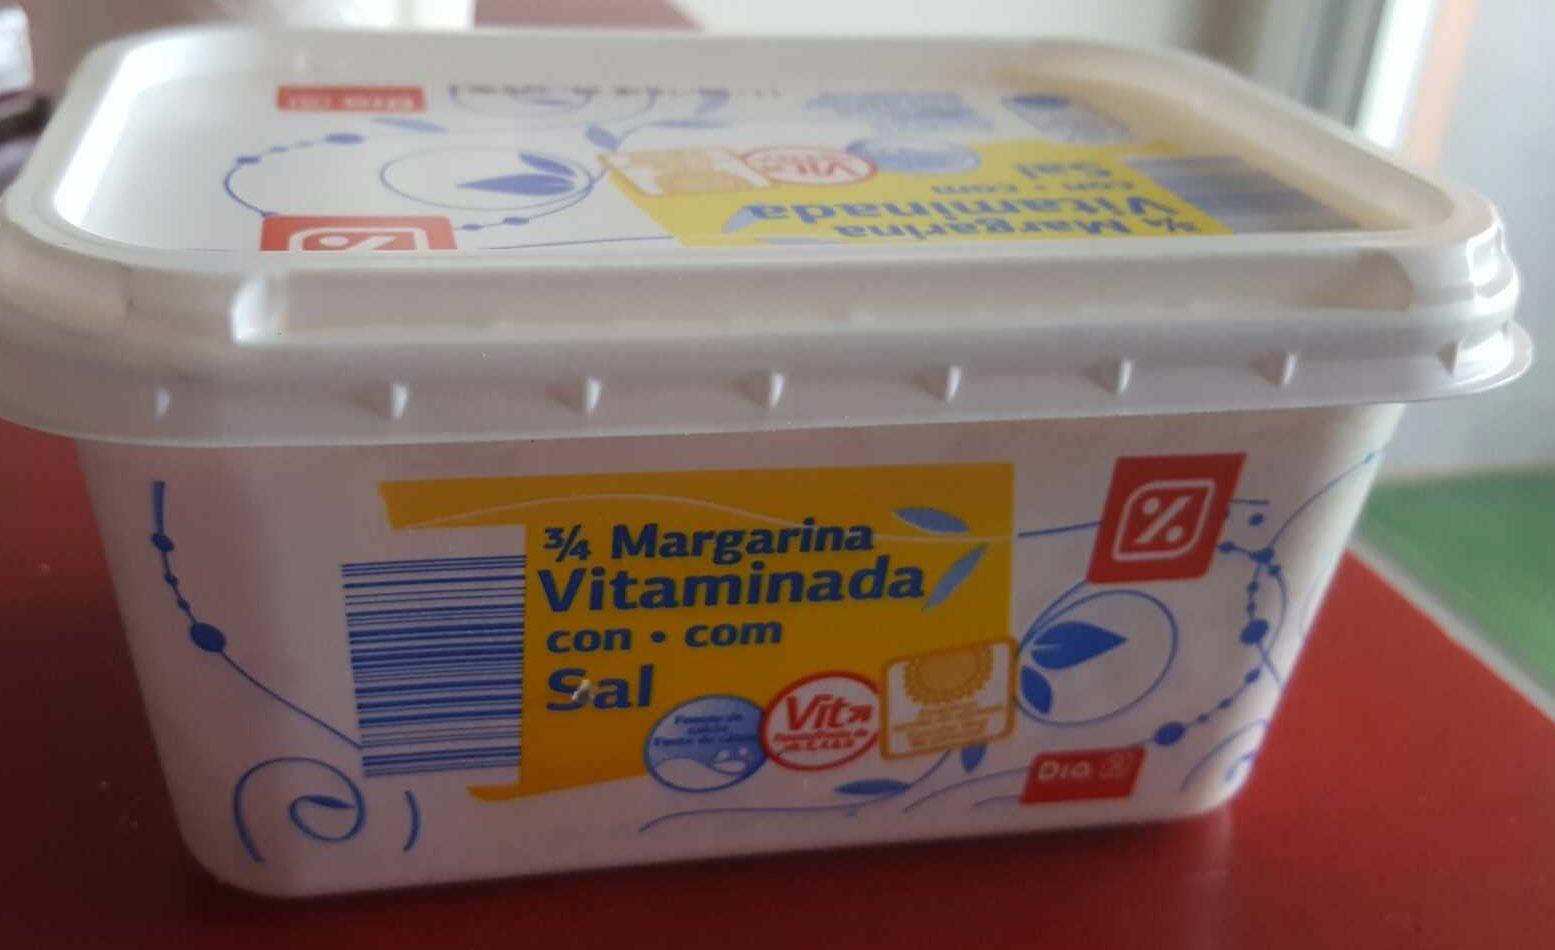 Margarina vitaminada con sal - Producto